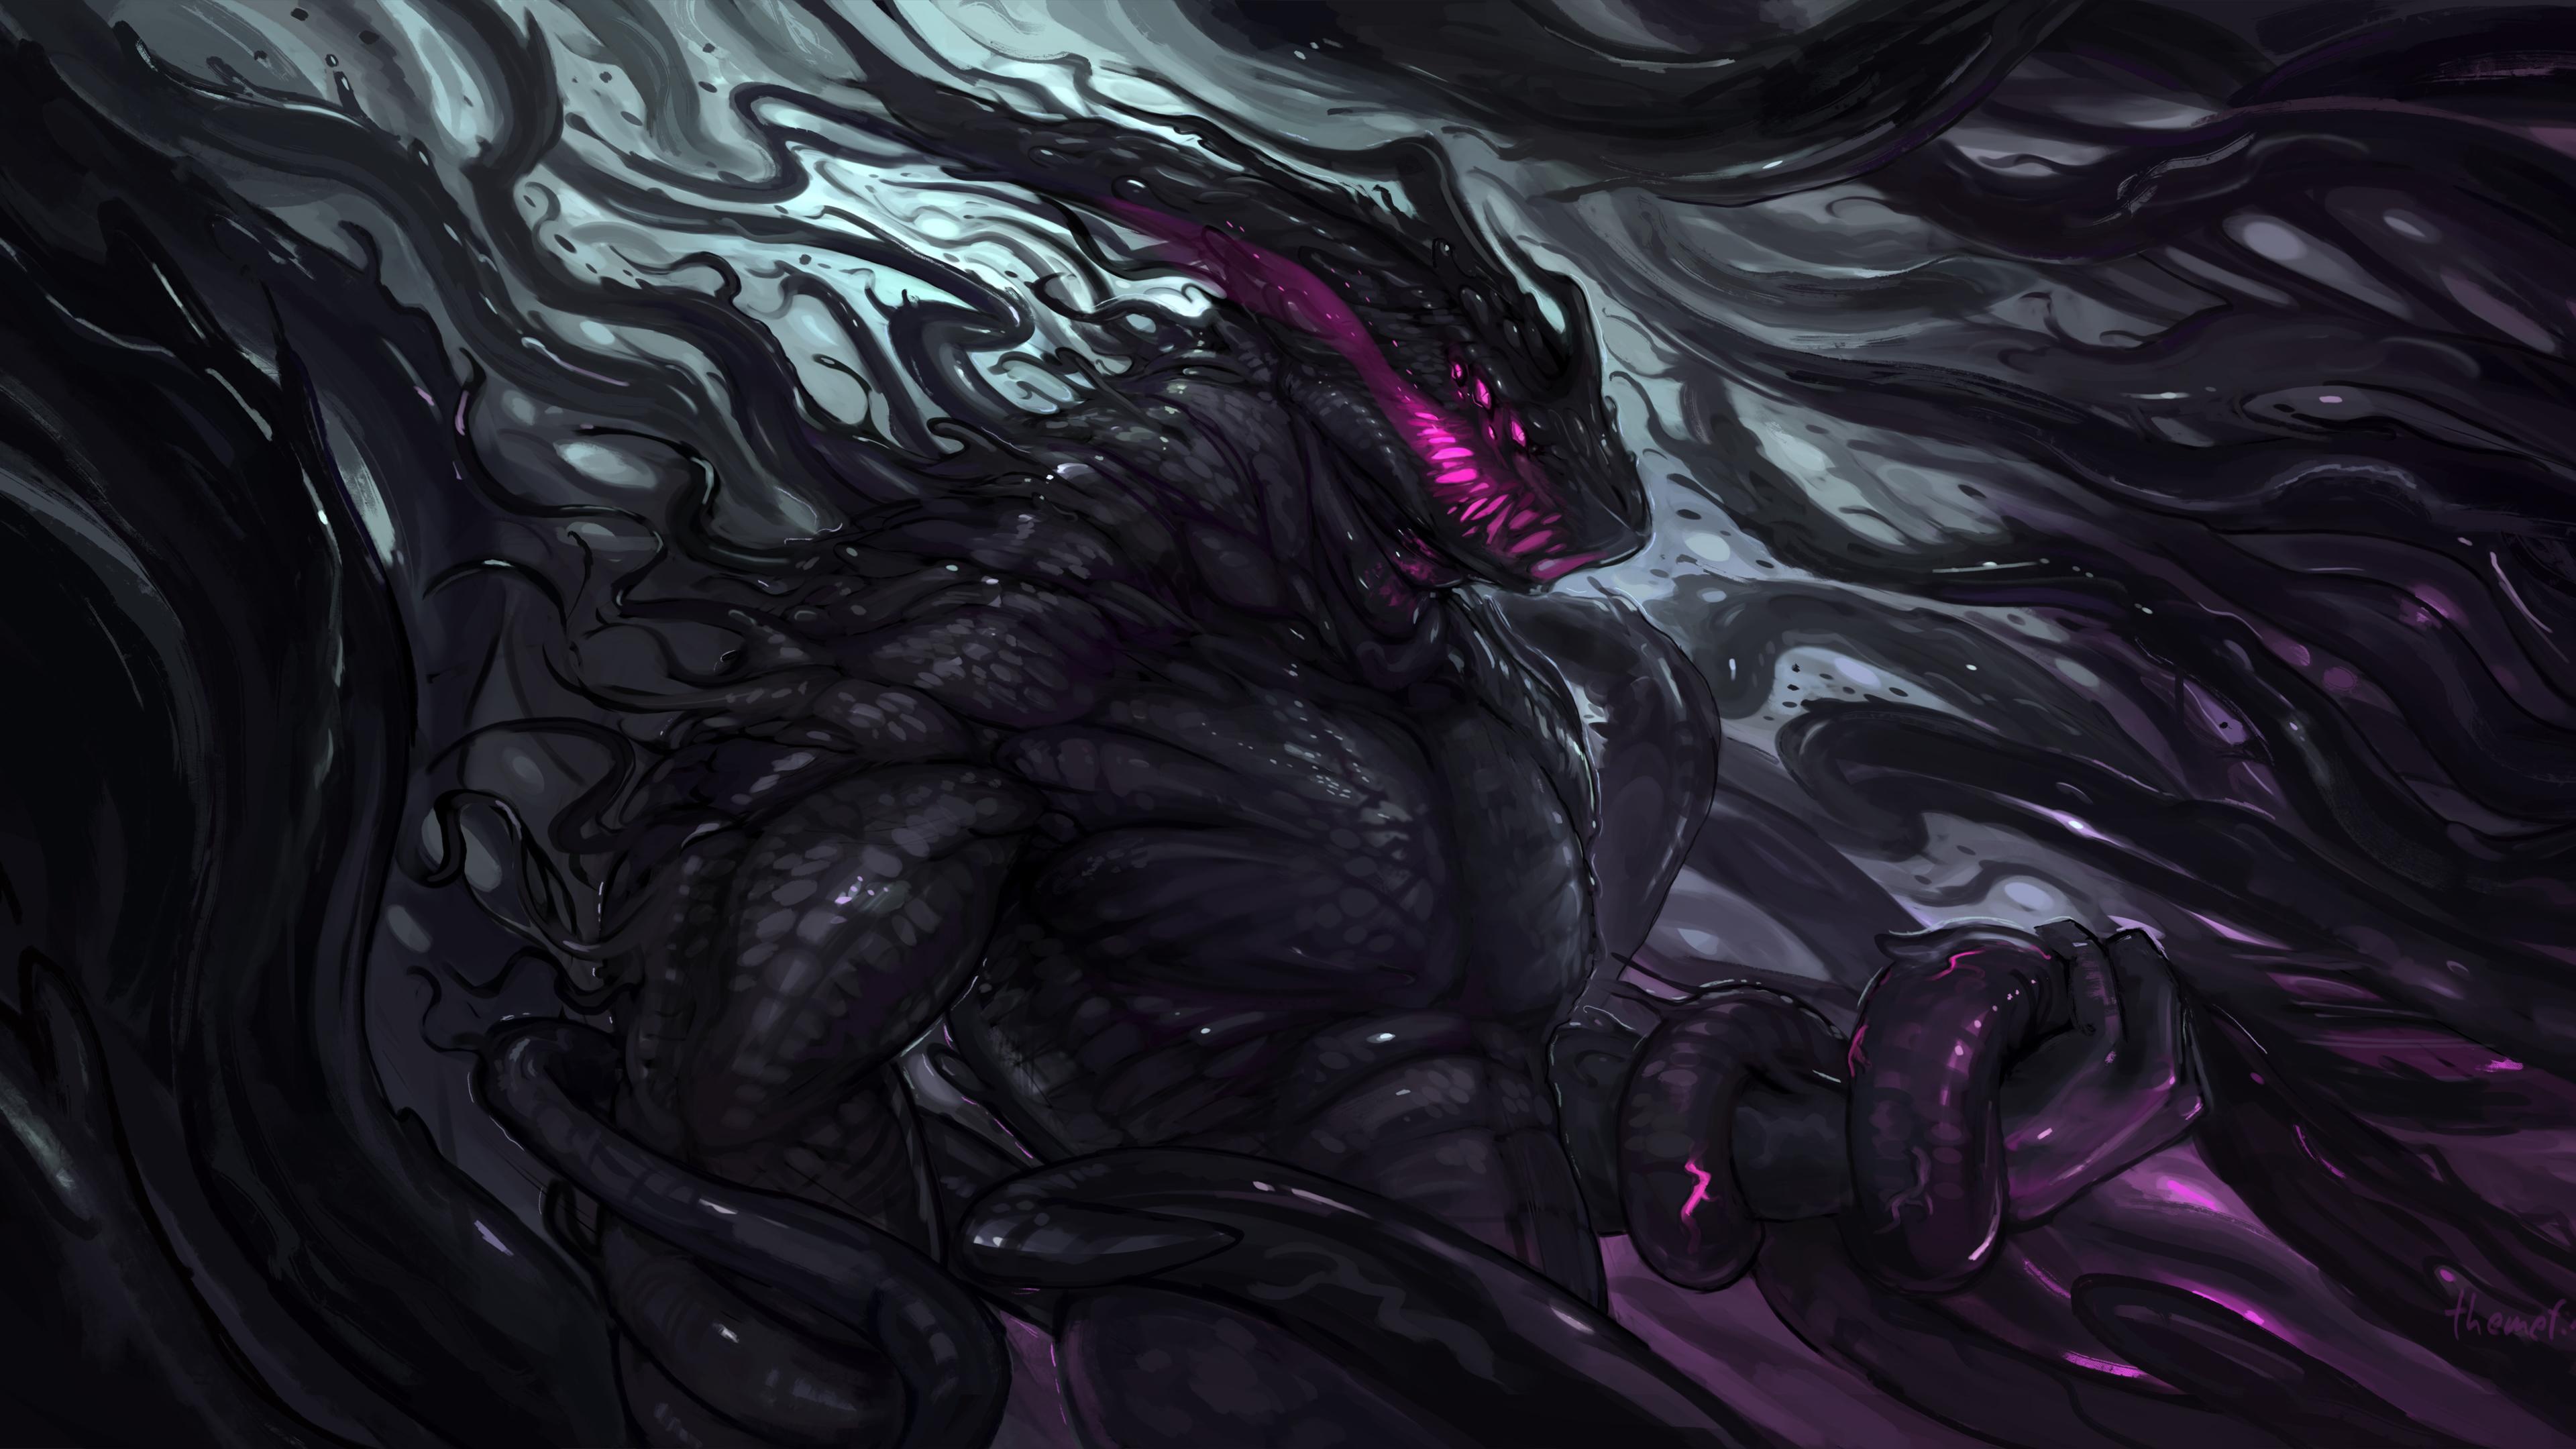 dark creature monster art 4k 1540755169 - Dark Creature Monster Art 4k - monster wallpapers, hd-wallpapers, digital art wallpapers, deviantart wallpapers, dark wallpapers, creature wallpapers, artist wallpapers, 4k-wallpapers